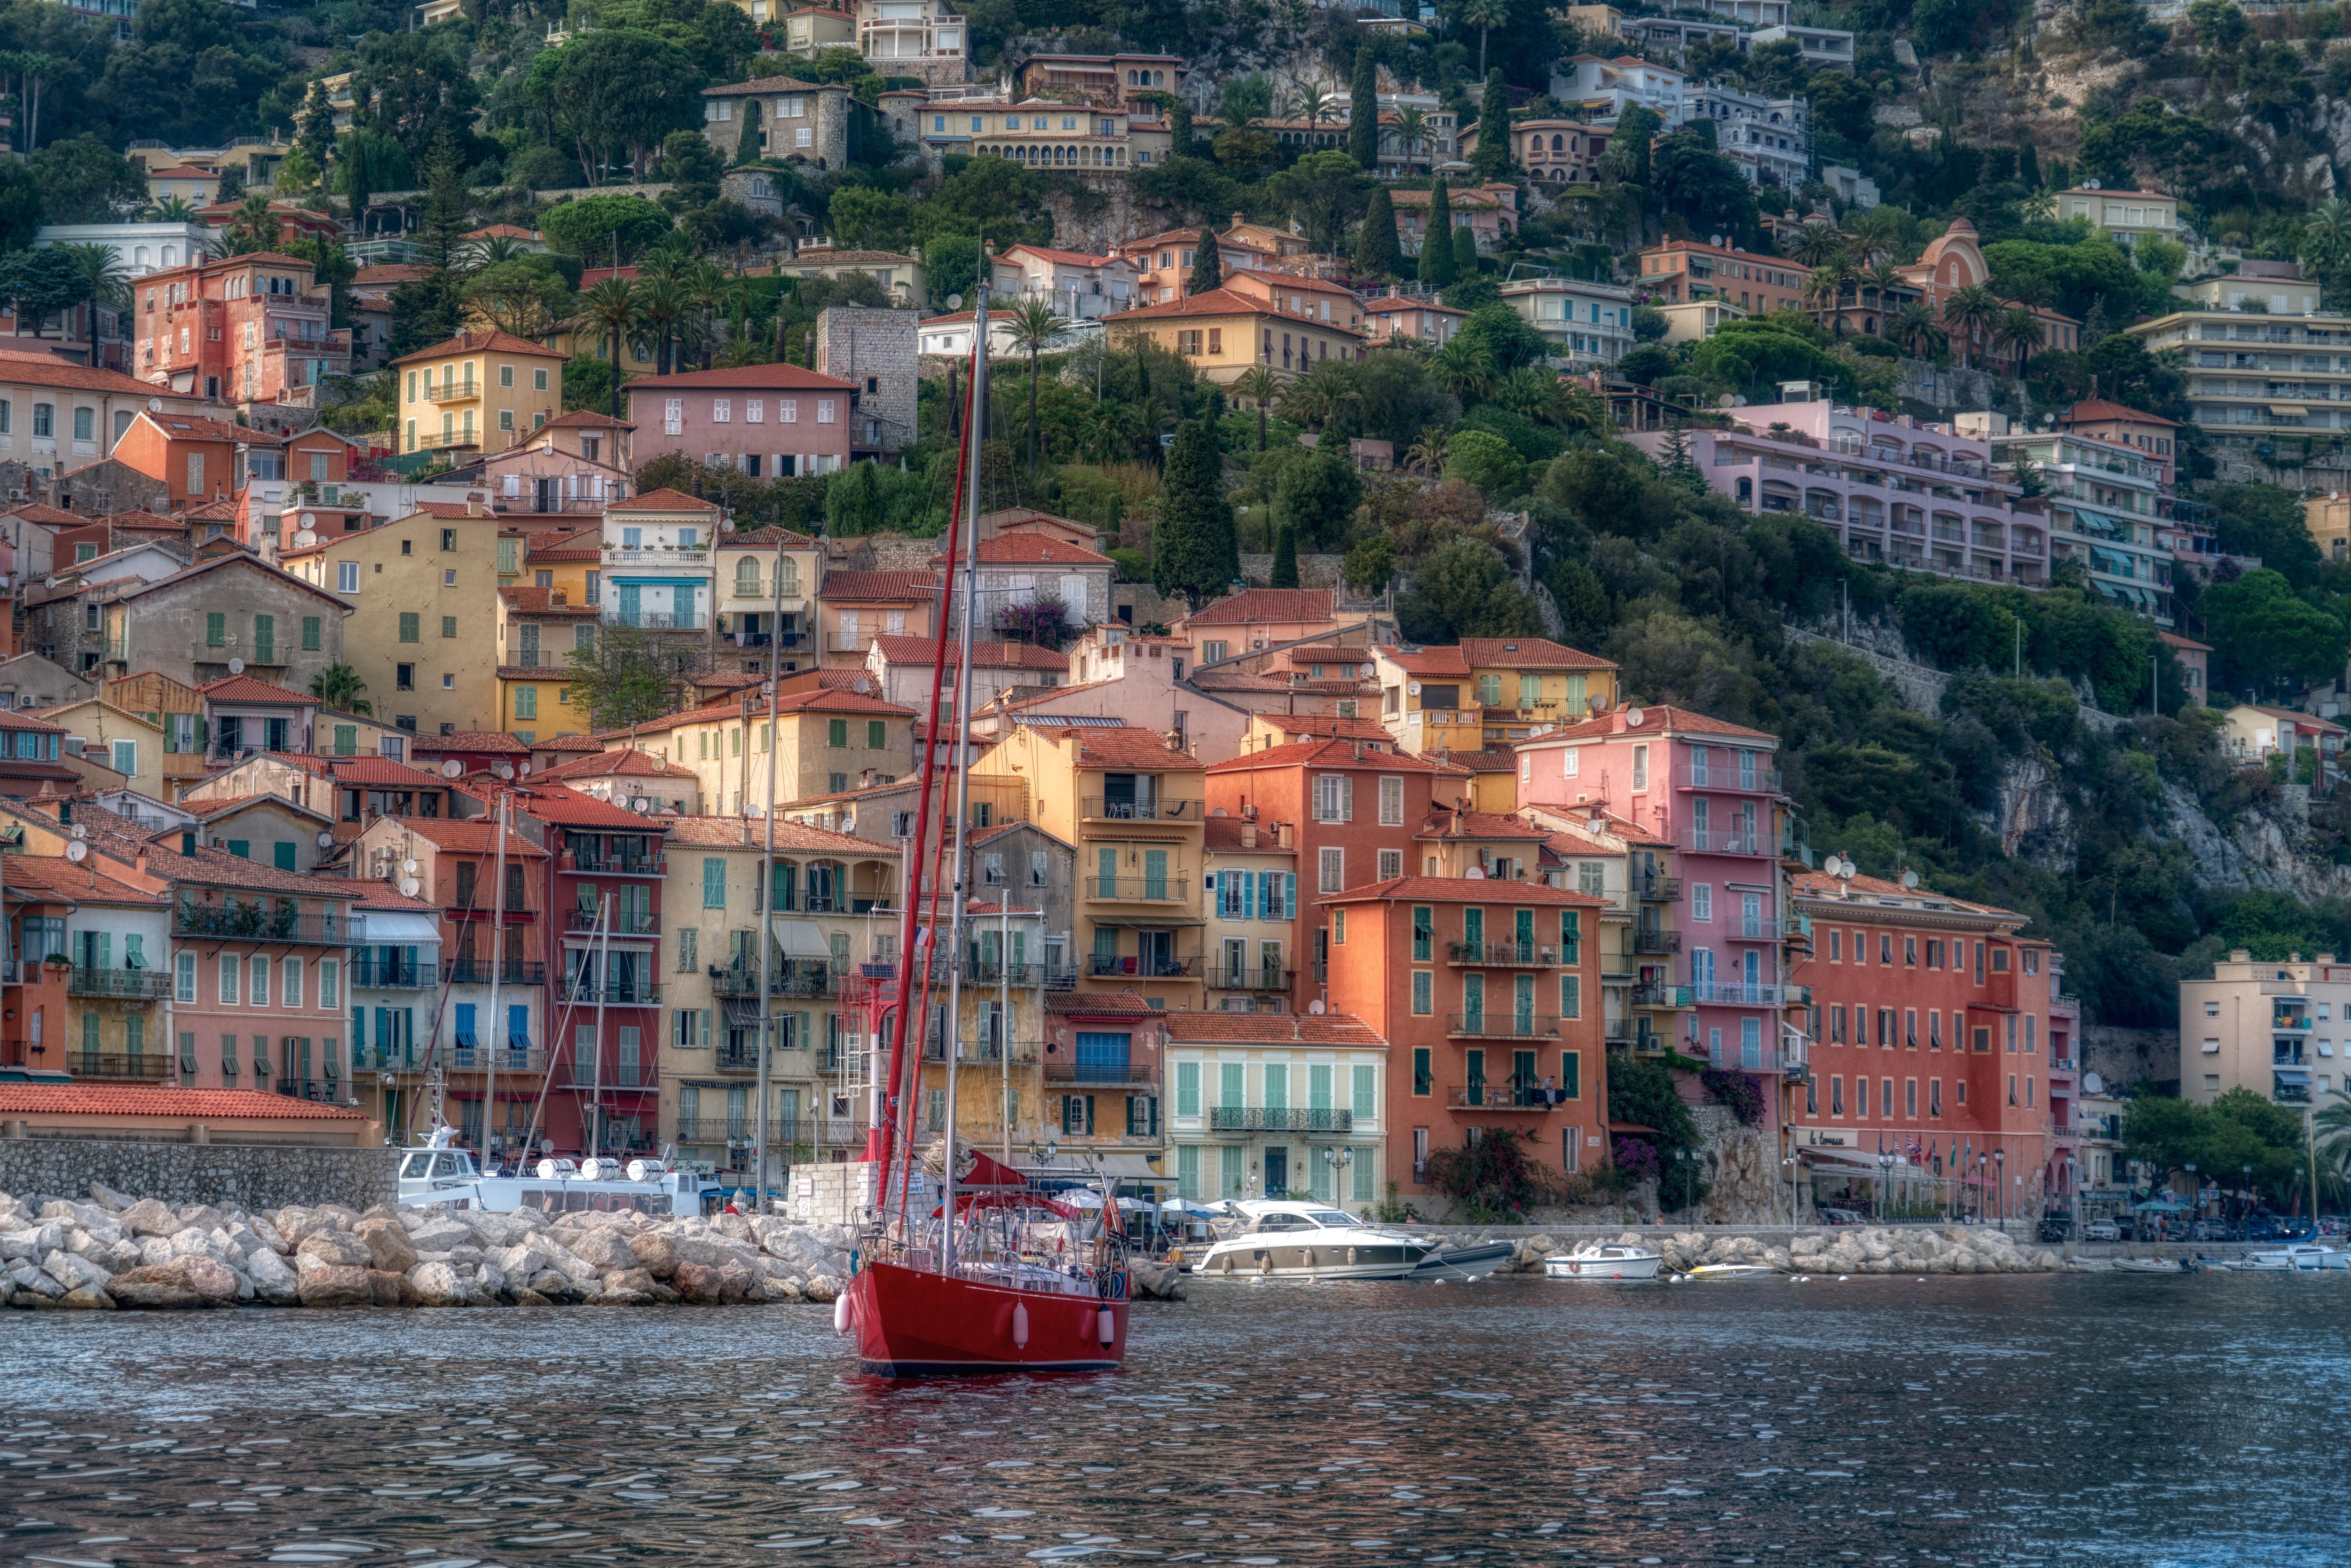 Картинка Франция French Riviera Villefranche-sur-Mer HDRI Яхта Побережье Дома город 5000x3335 HDR берег Города Здания